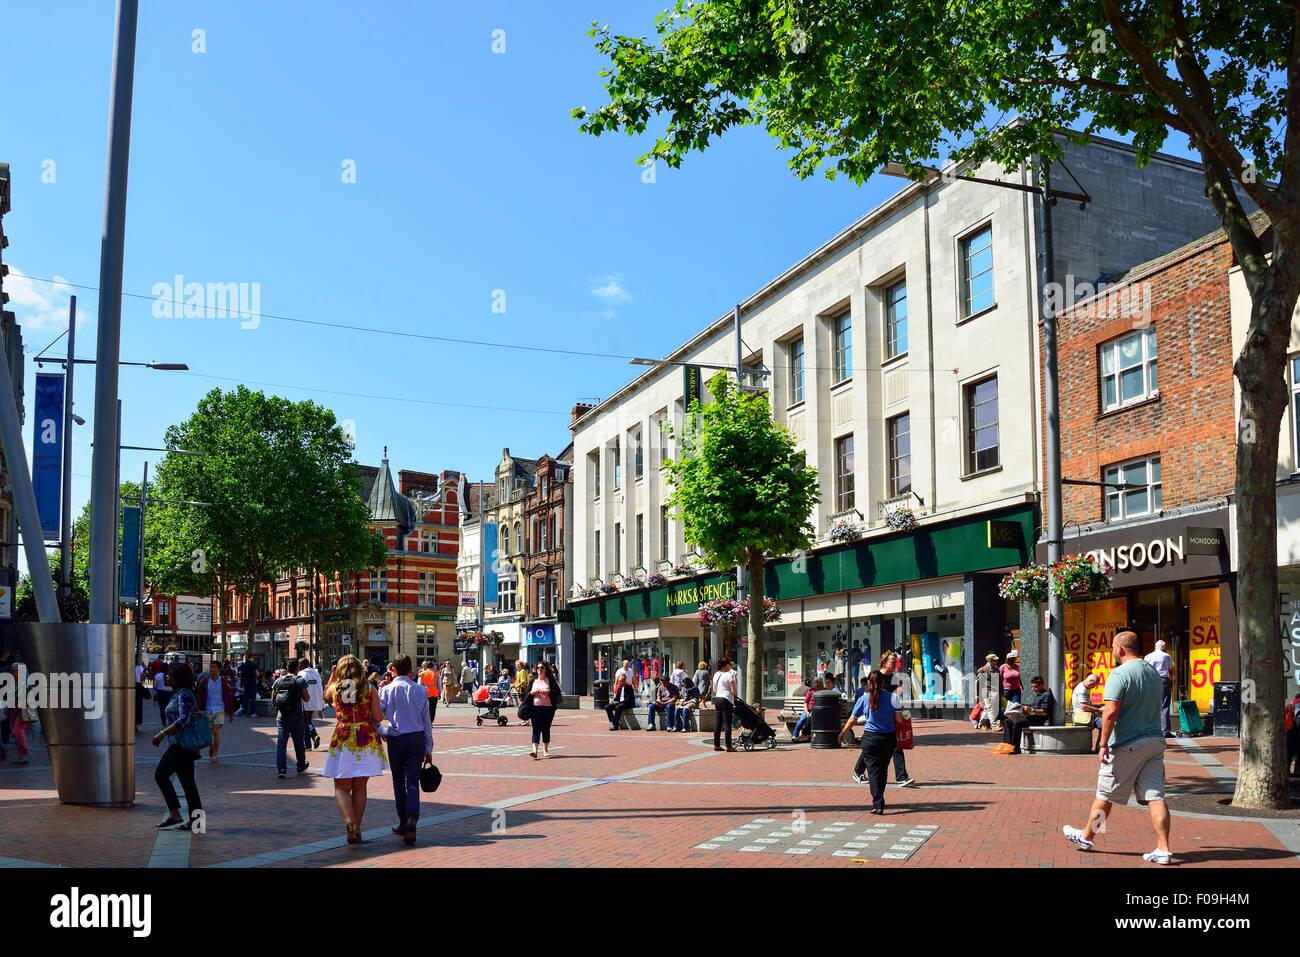 Pedestrianised Broad Street, Reading, Berkshire, England, United Kingdom Stock Photo